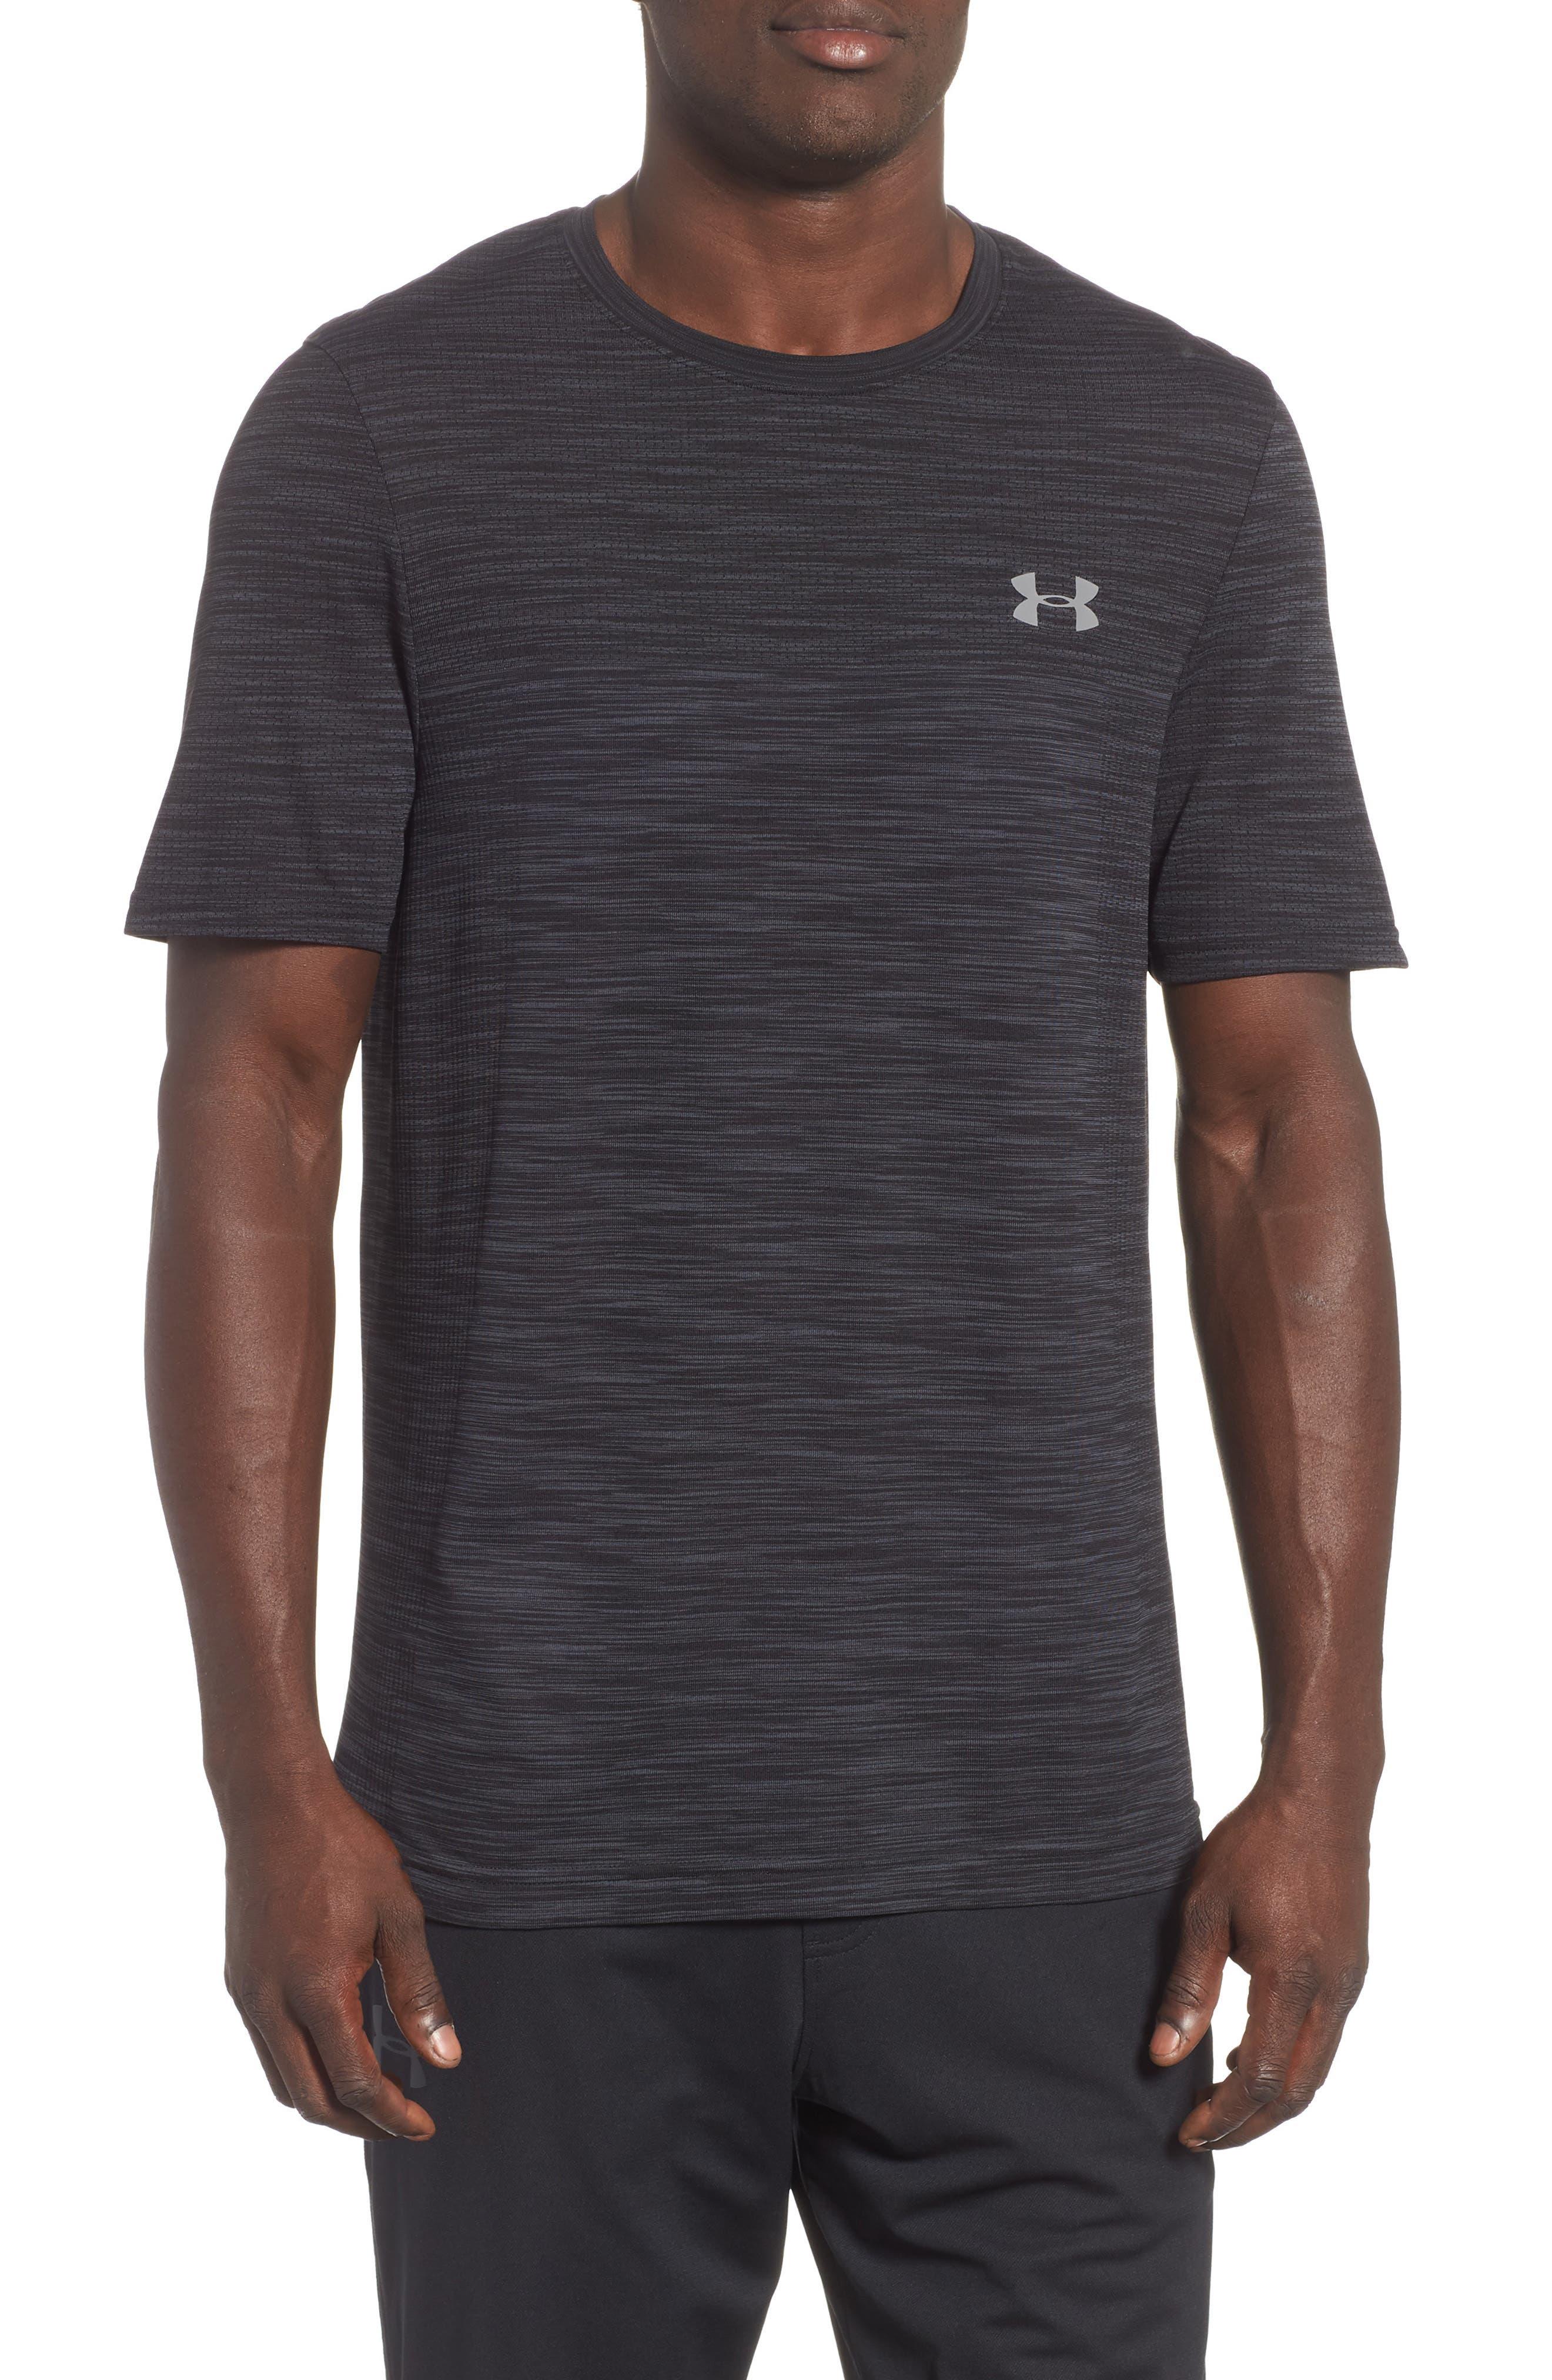 Siphon Performance T-Shirt,                         Main,                         color, BLACK